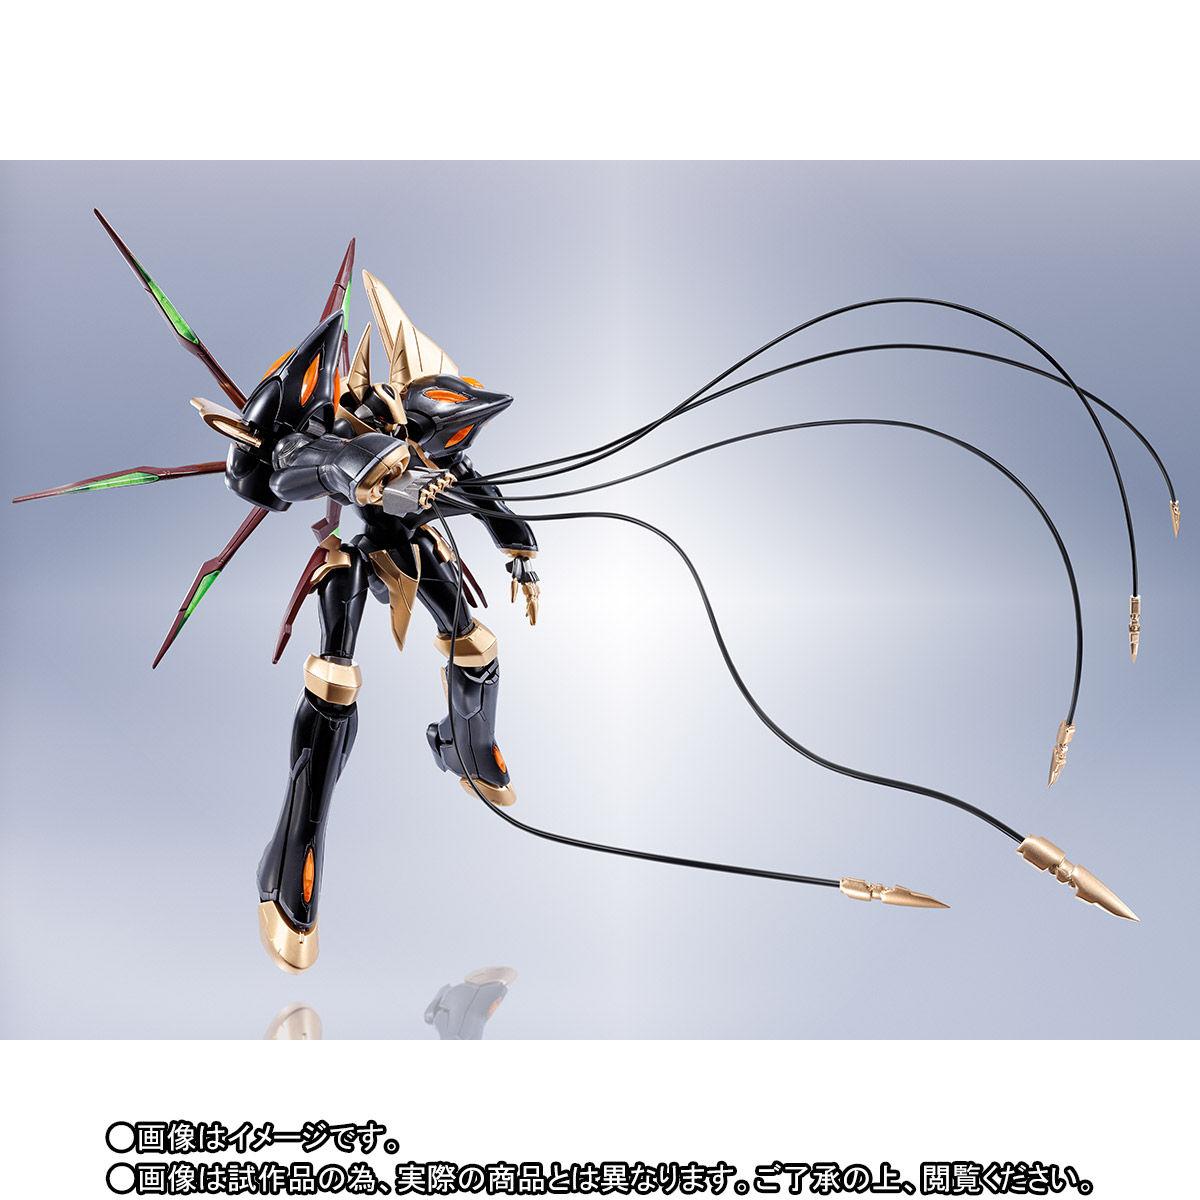 ROBOT魂〈SIDE KMF〉『ガウェイン ~BLACK REBELLION~』コードギアス 可動フィギュア-006